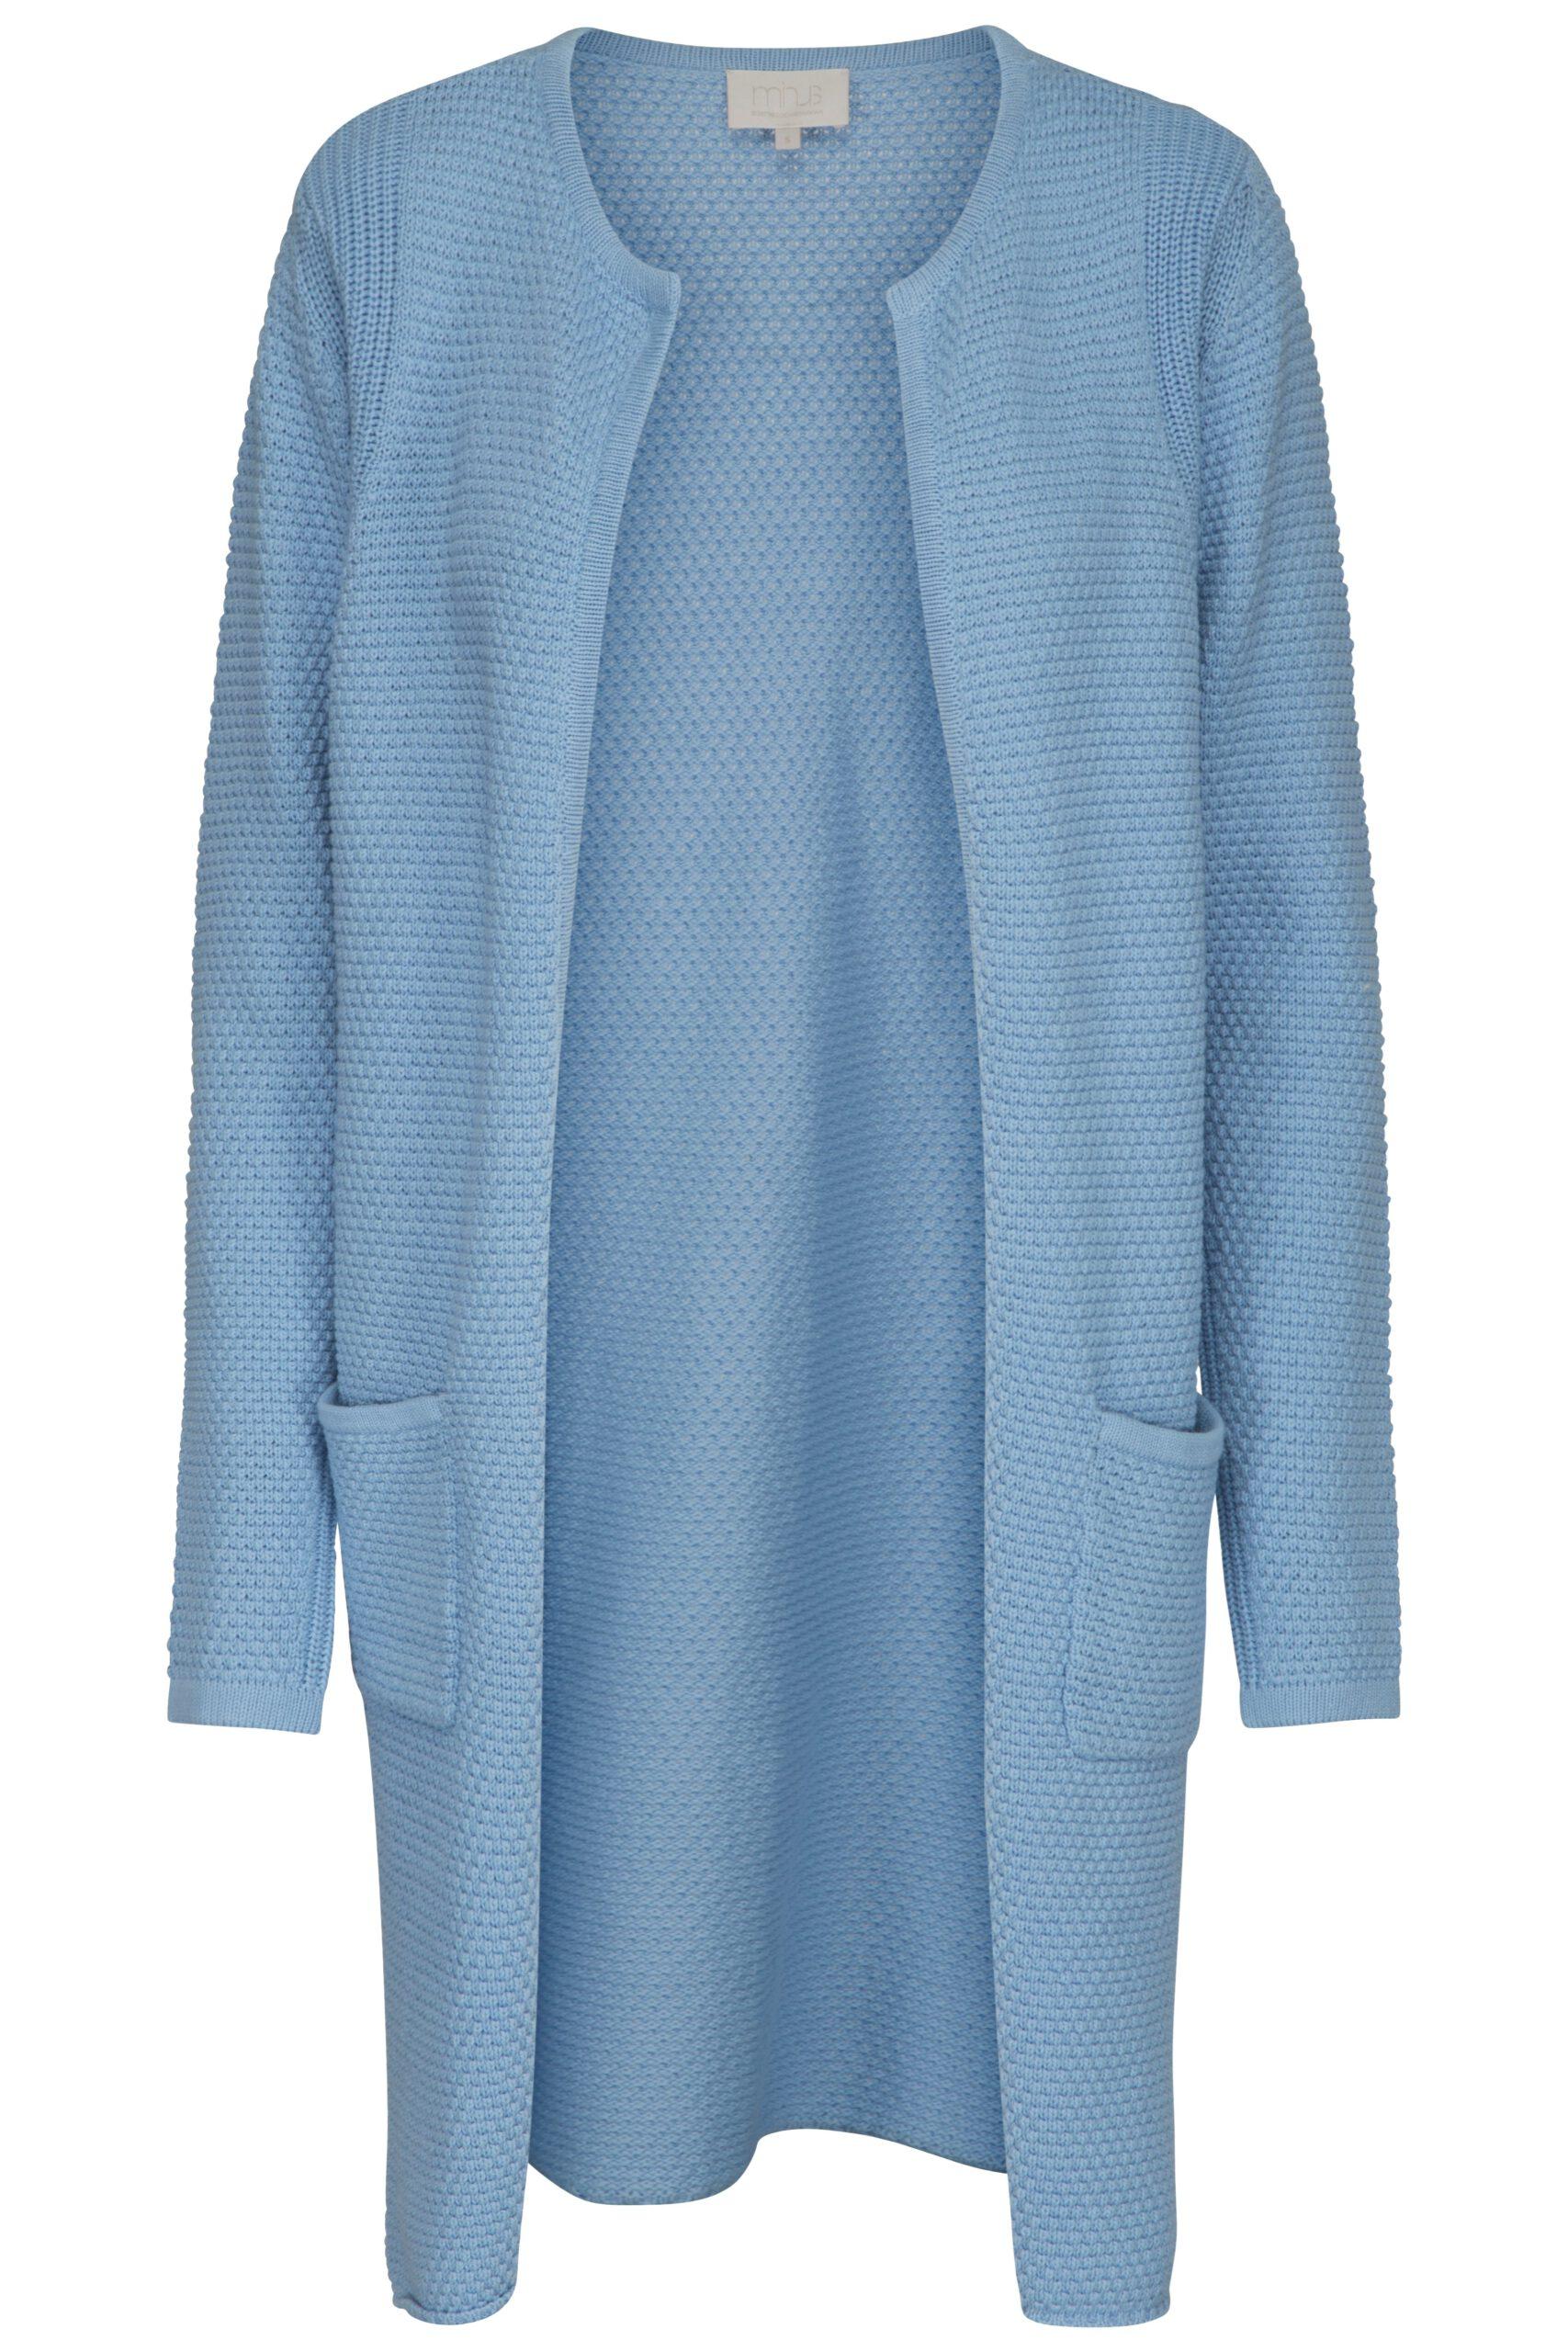 Tessa Knit heaven blue